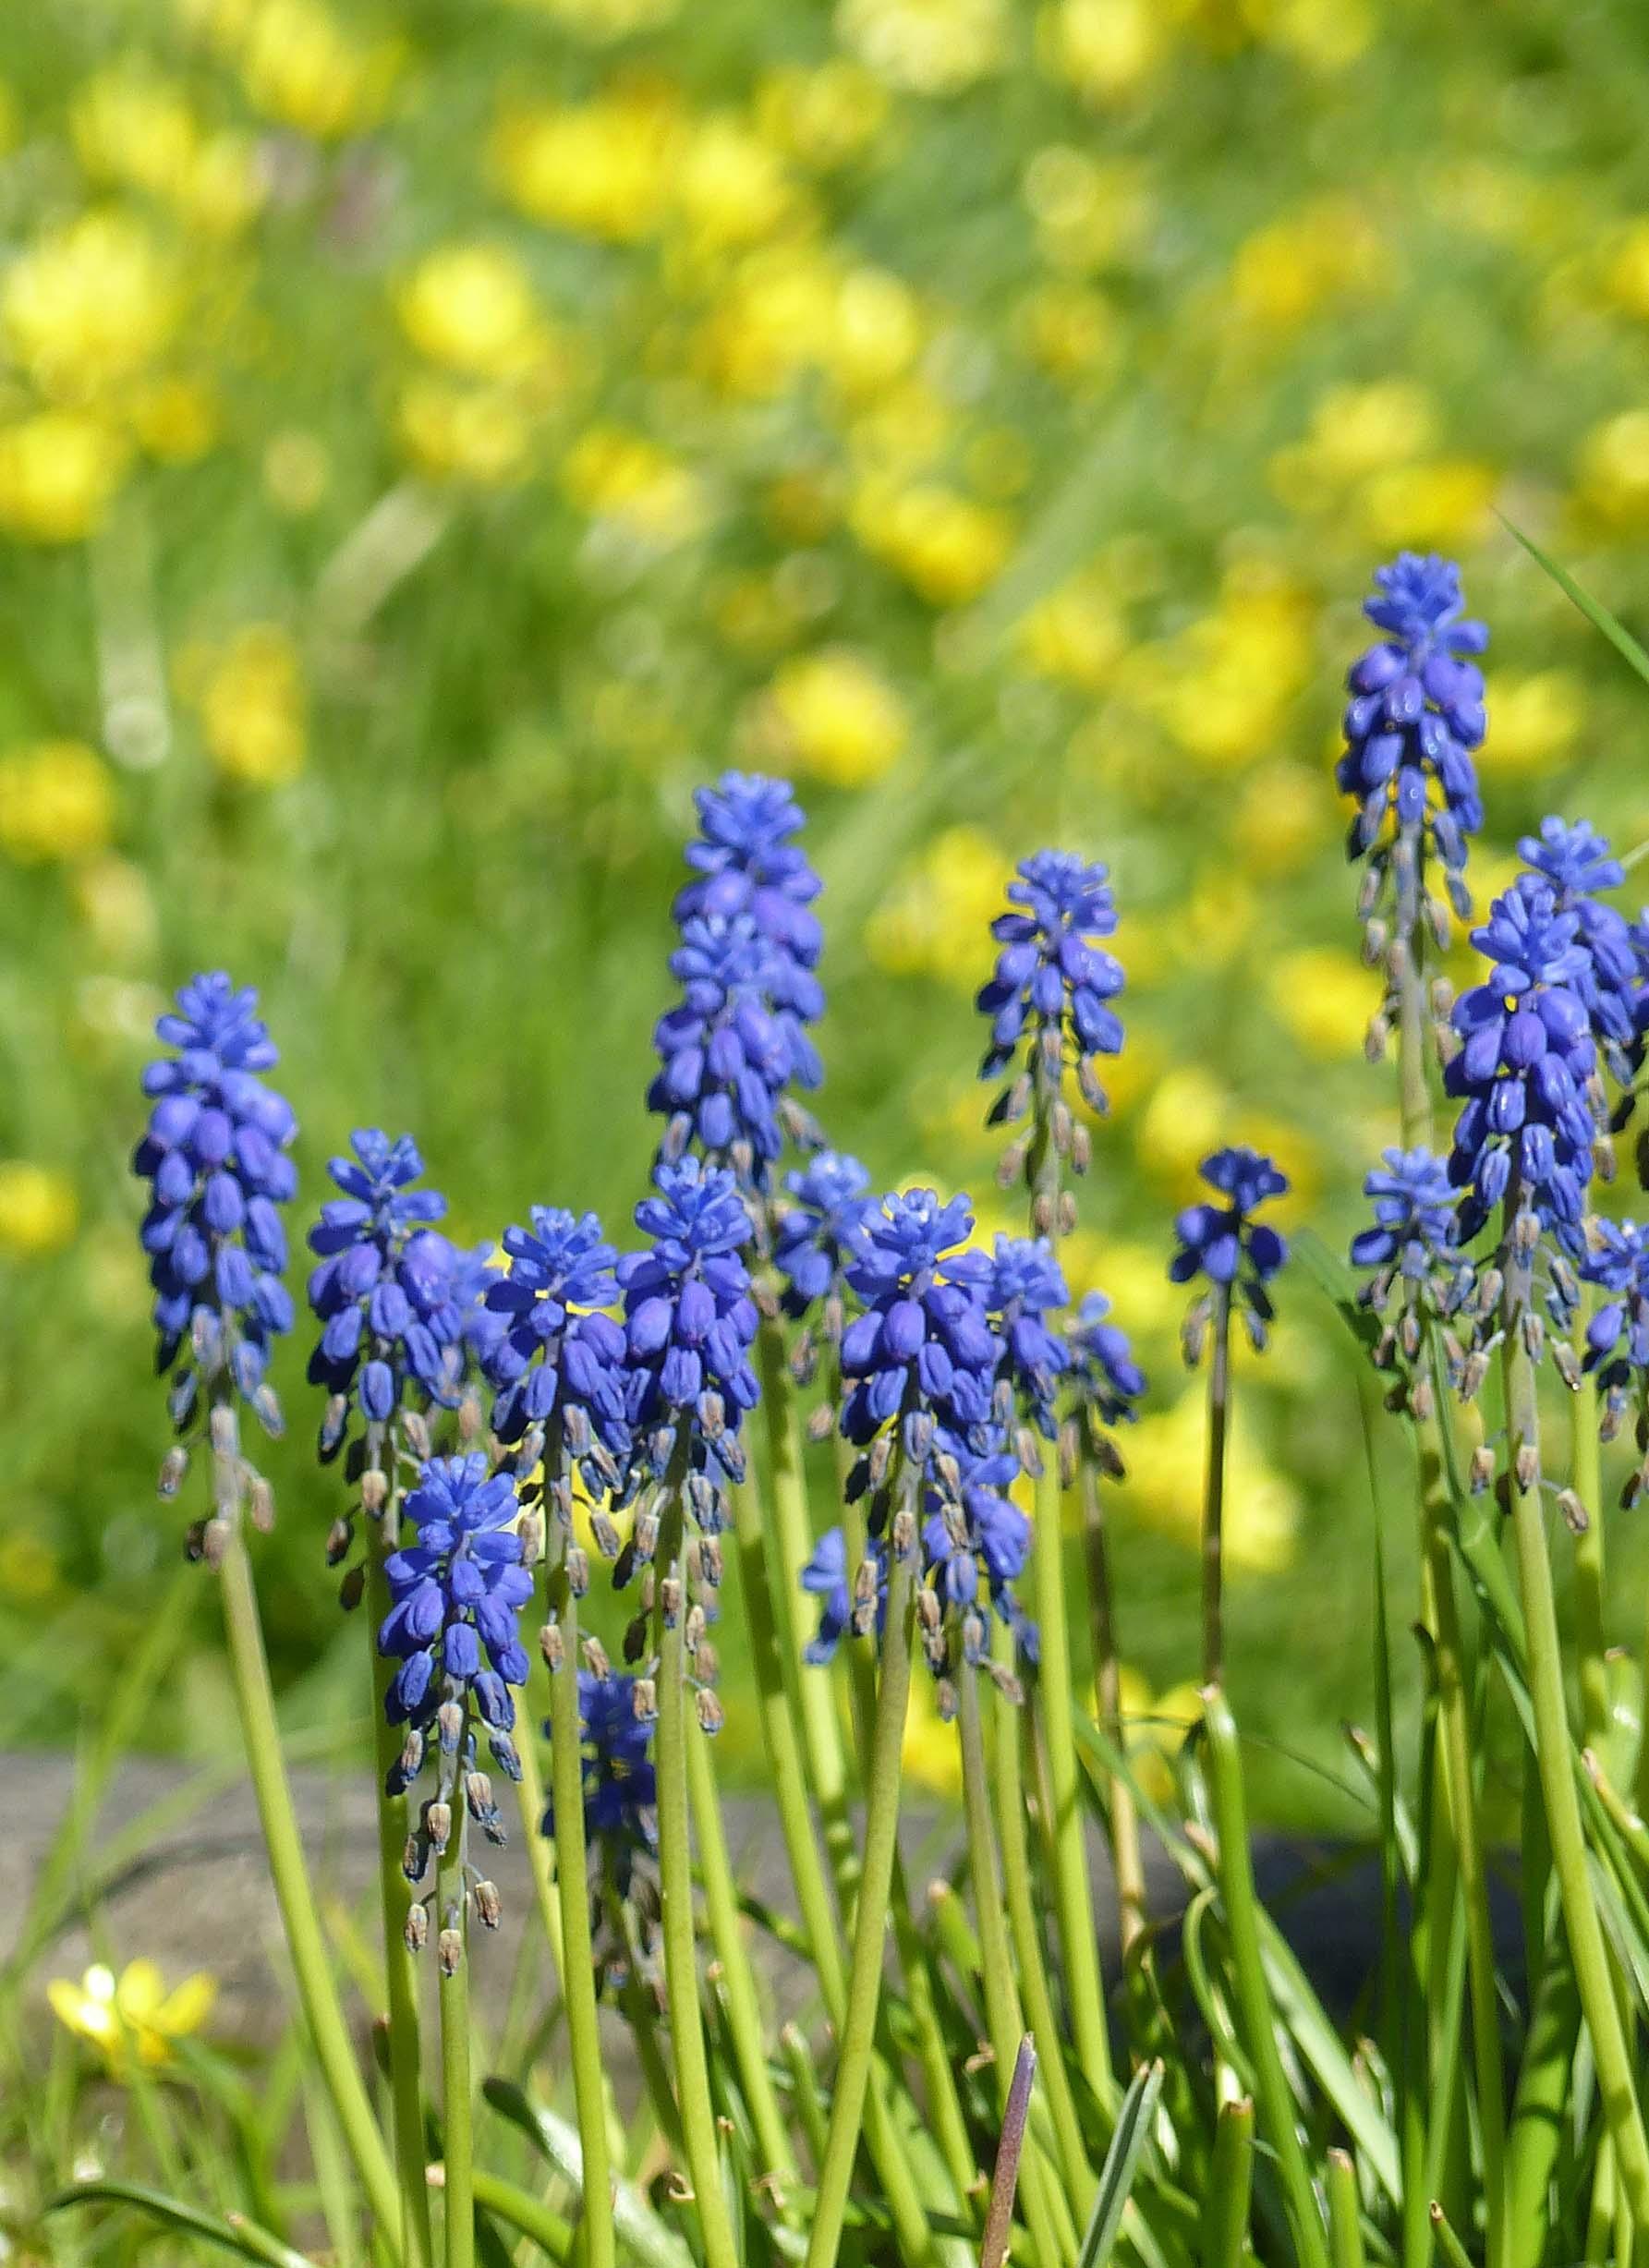 Small blue/mauve flowers